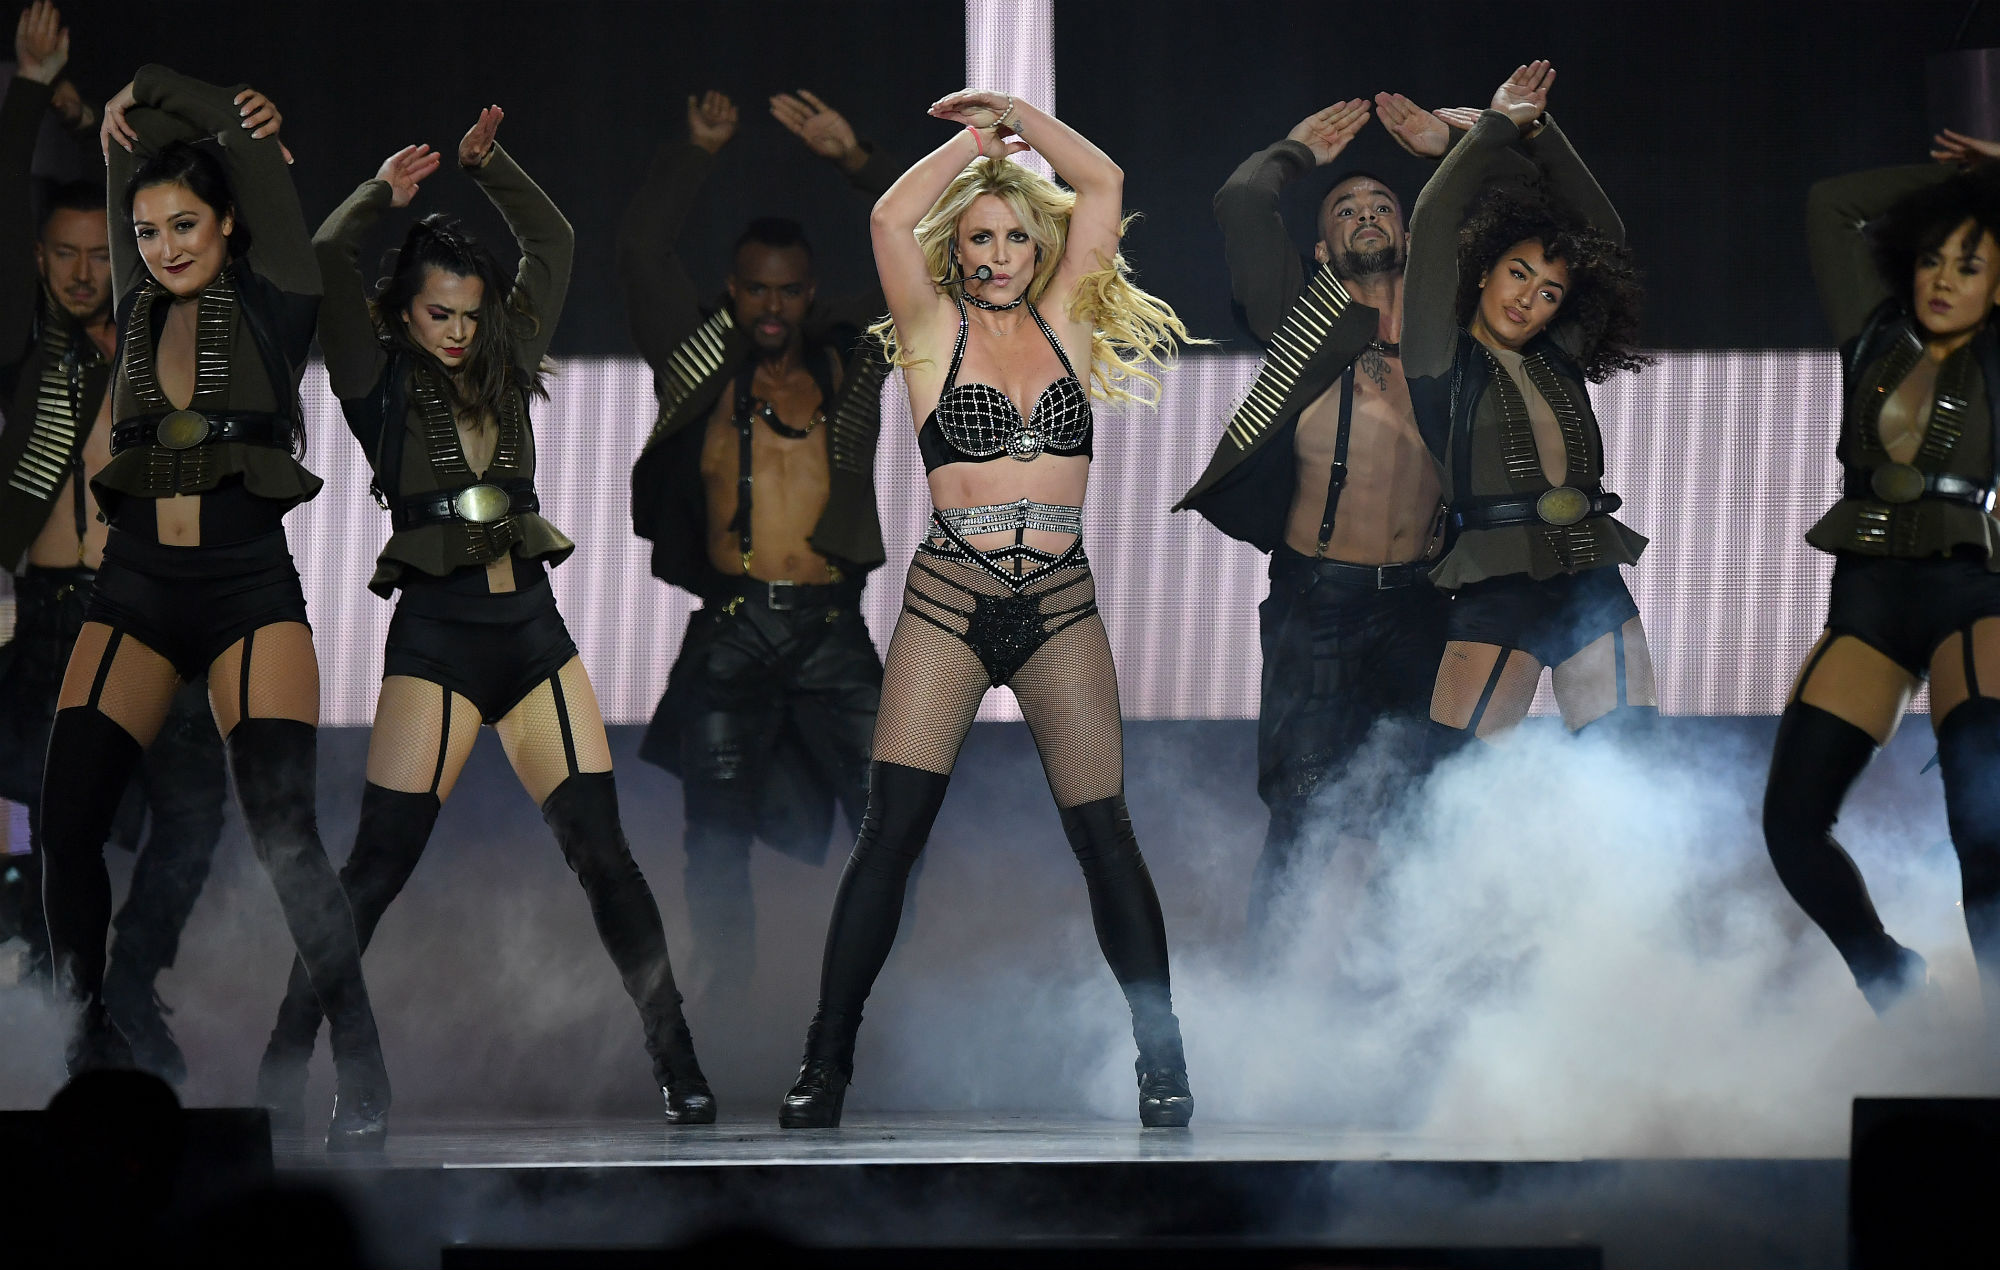 Britney Spears Cancels Las Vegas Residency To Focus On